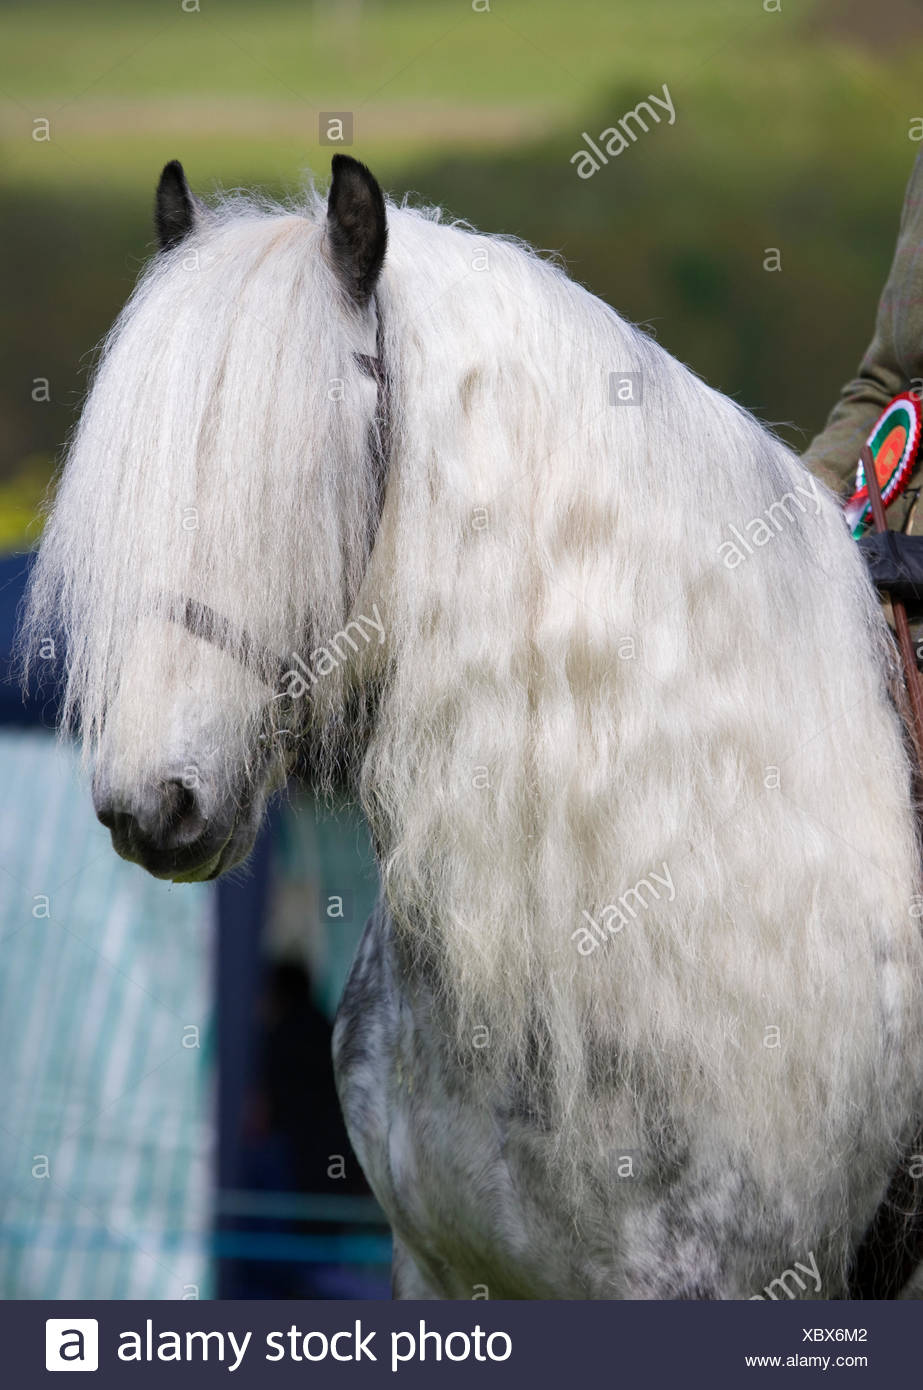 Head portrait of a rare grey Yorkshire Dales gelding (Equus caballus) with long mane, at Glanusk Estate, Wales, UK - Stock Image